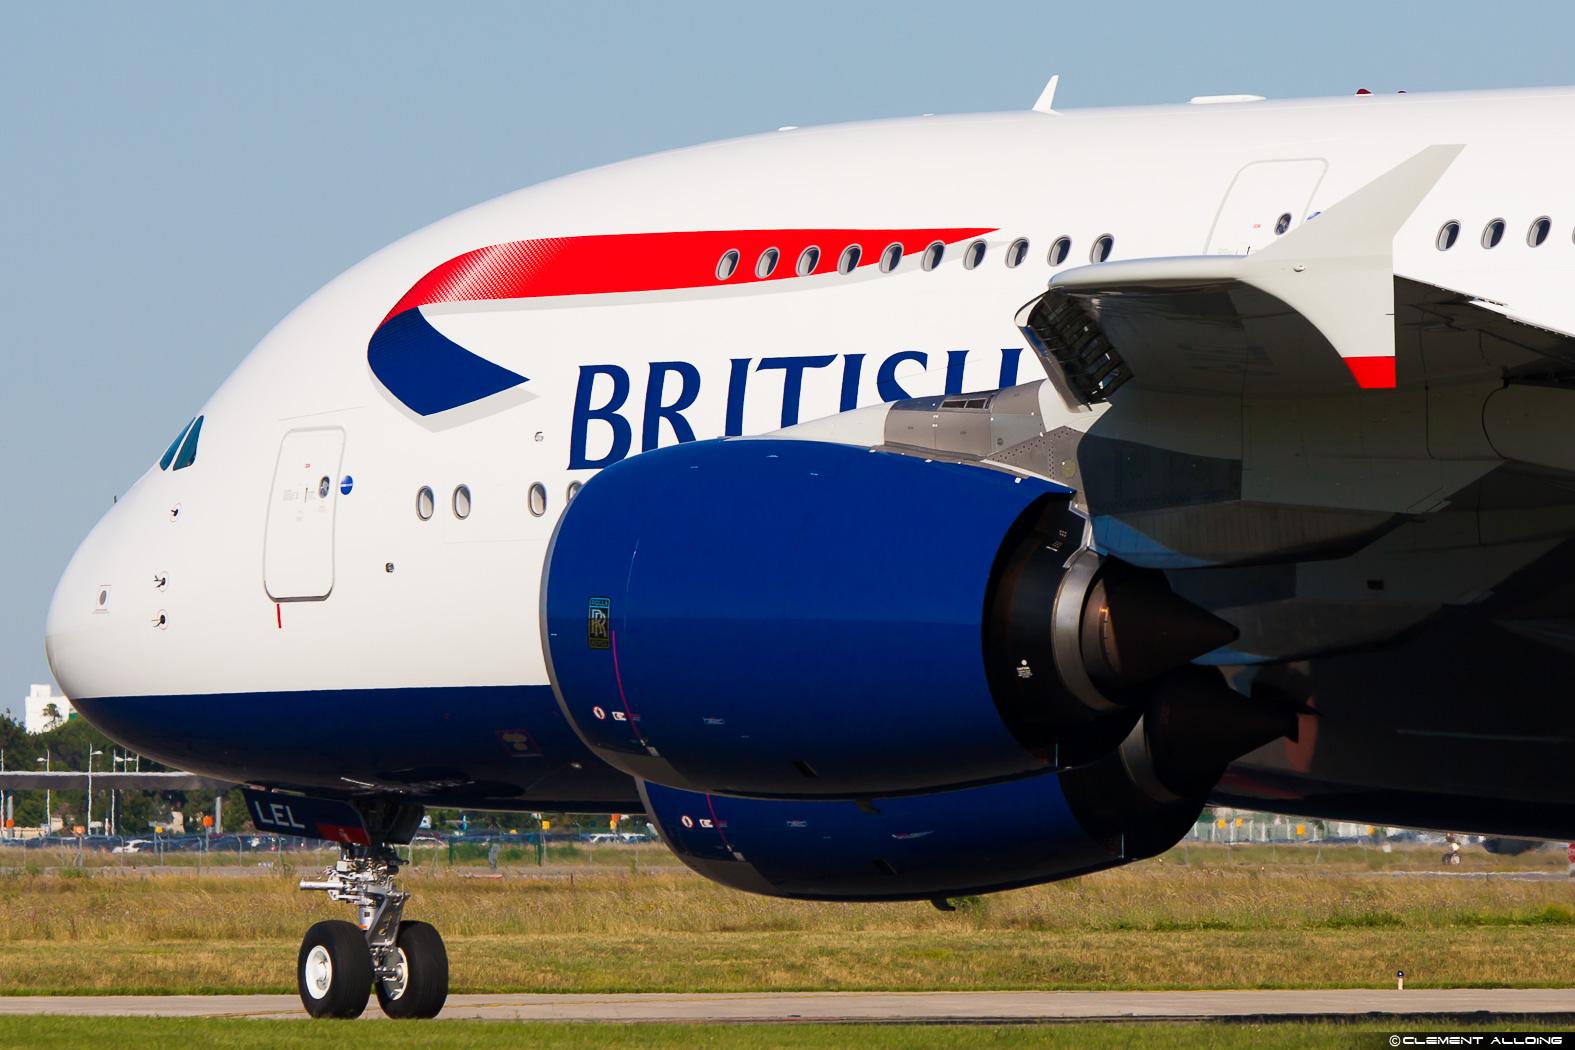 A380 British Airways G-XLEL - Clément Alloing – Tous droits réservés